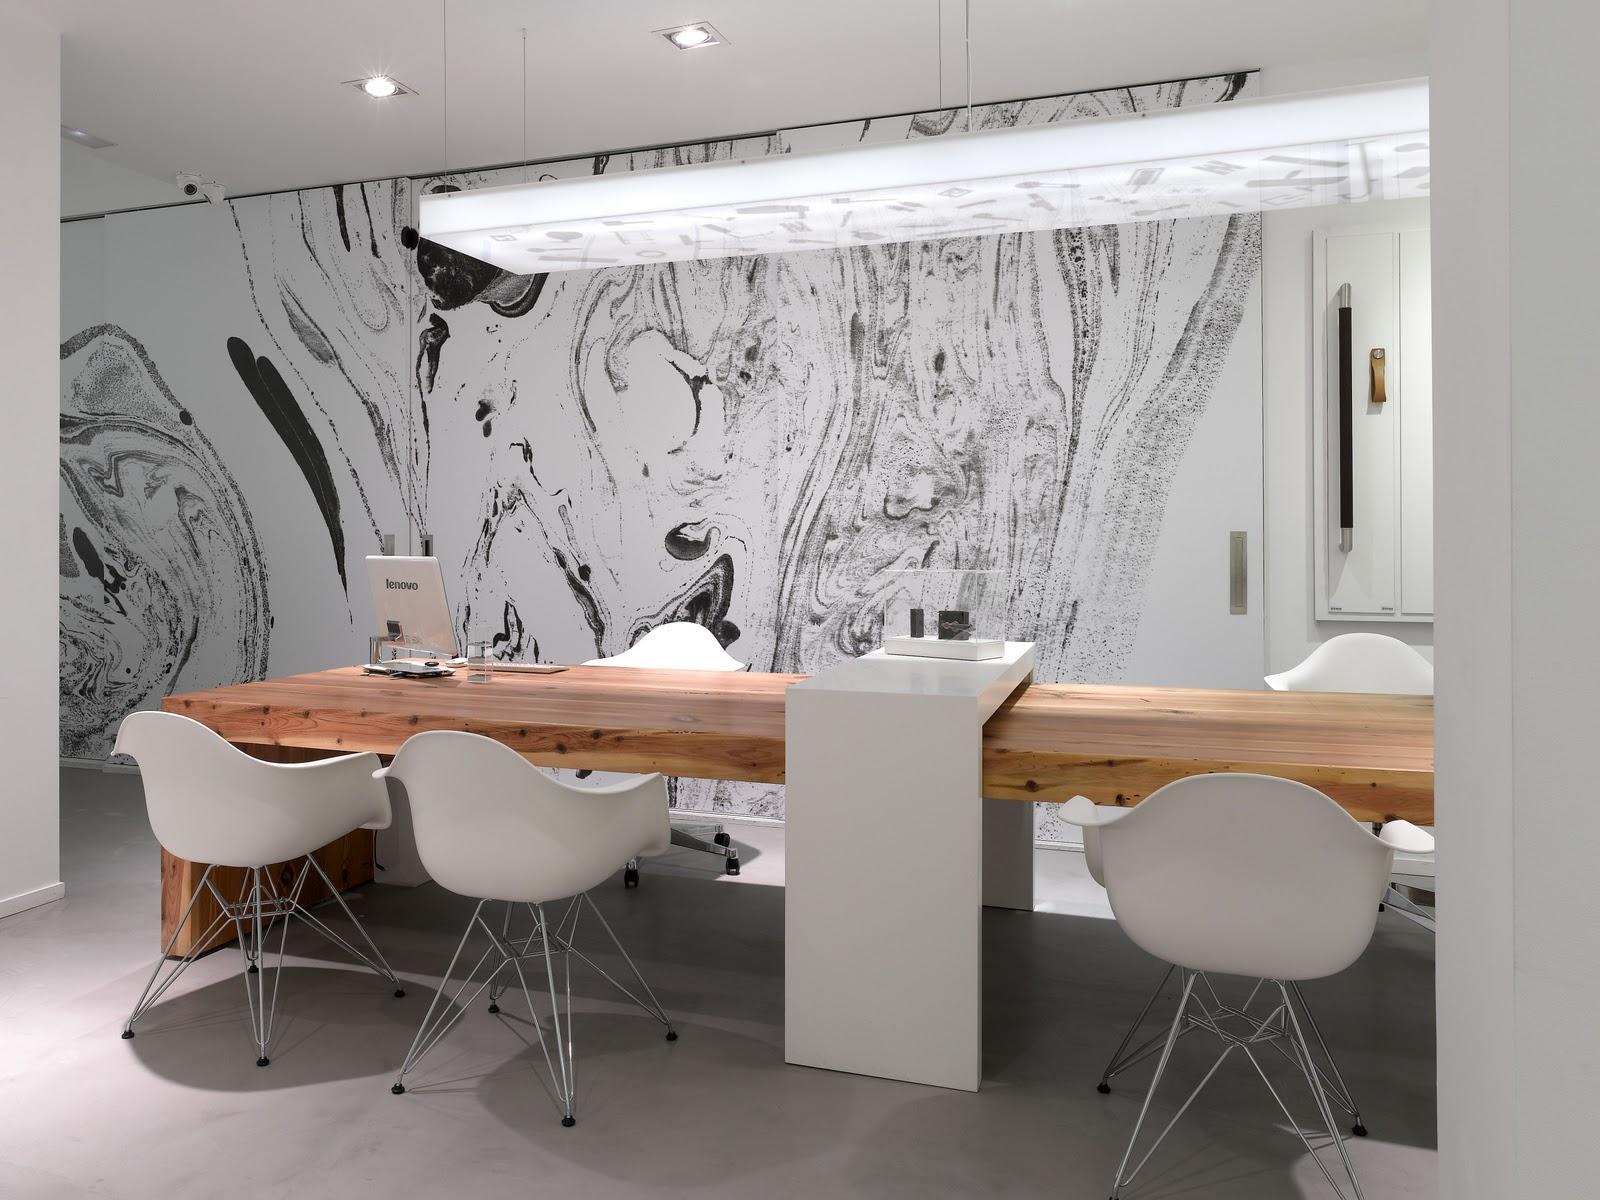 Labores modernas labores modernas para el picaporte de for Imagenes de oficinas decoradas